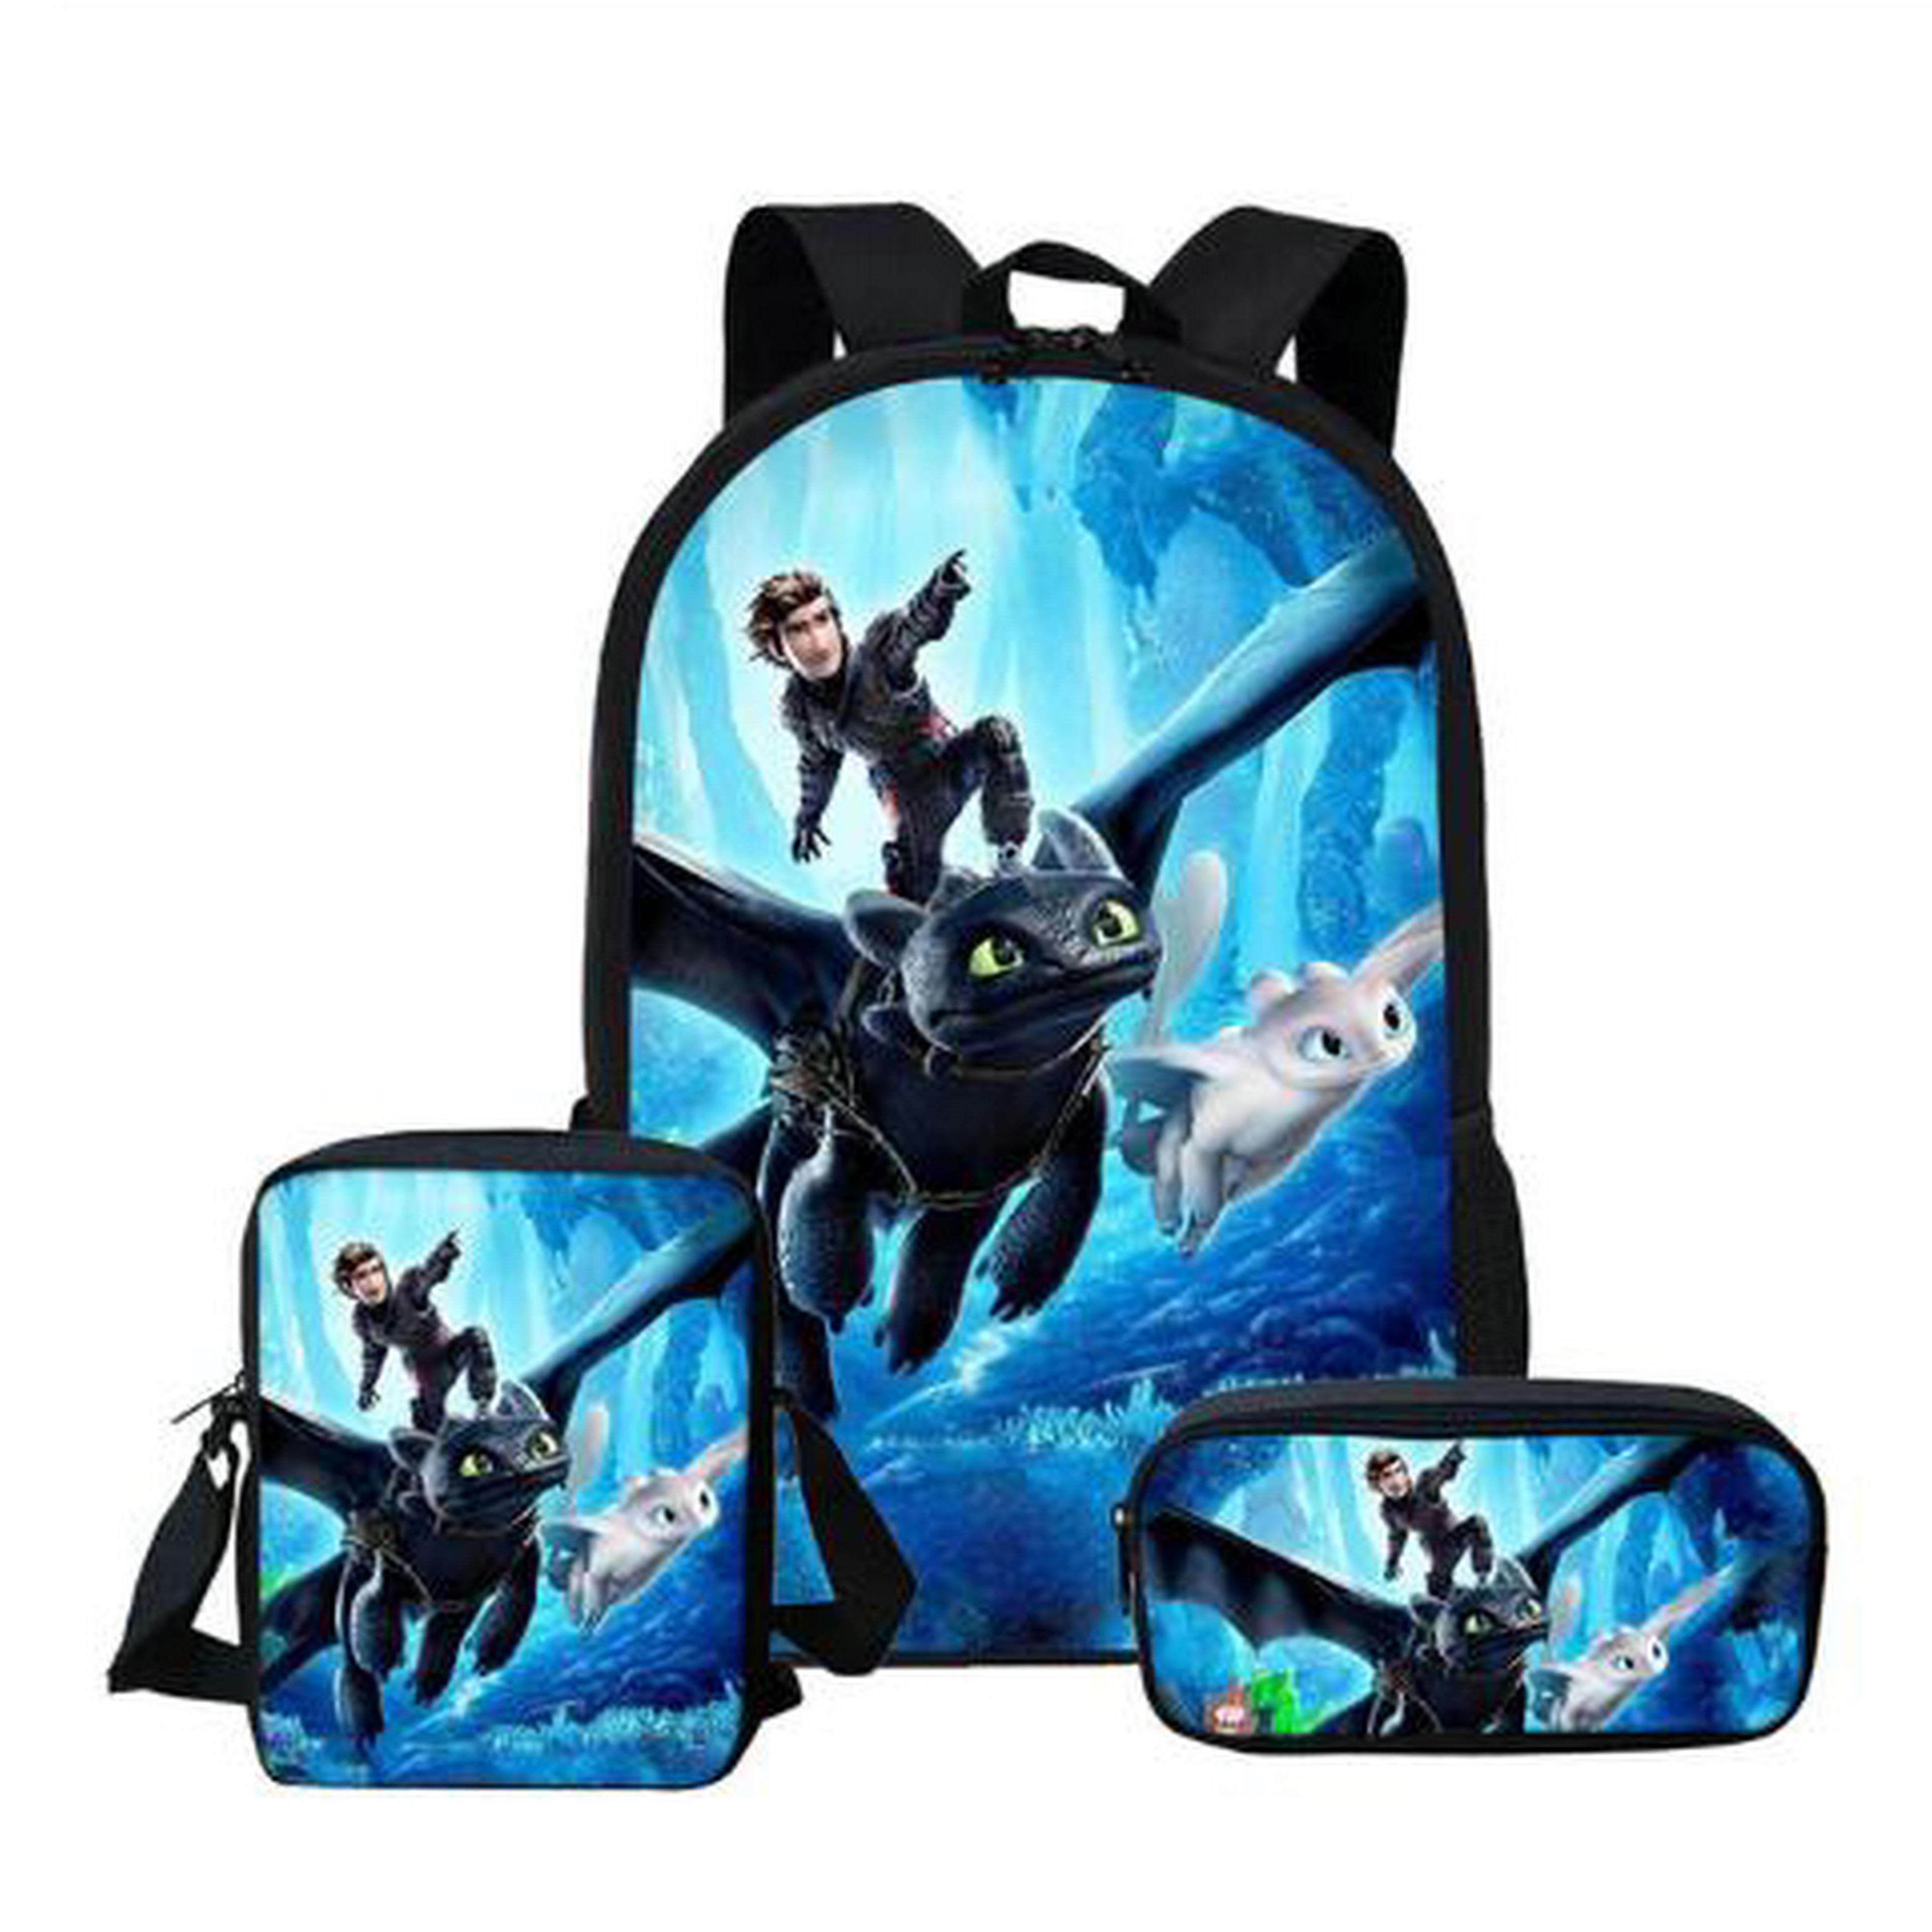 Cartoon Dragon 3D Printing Backpacks Pencil Bag 3Pcs Portfolio School Bags For Boys Girls Bookbag Satchel